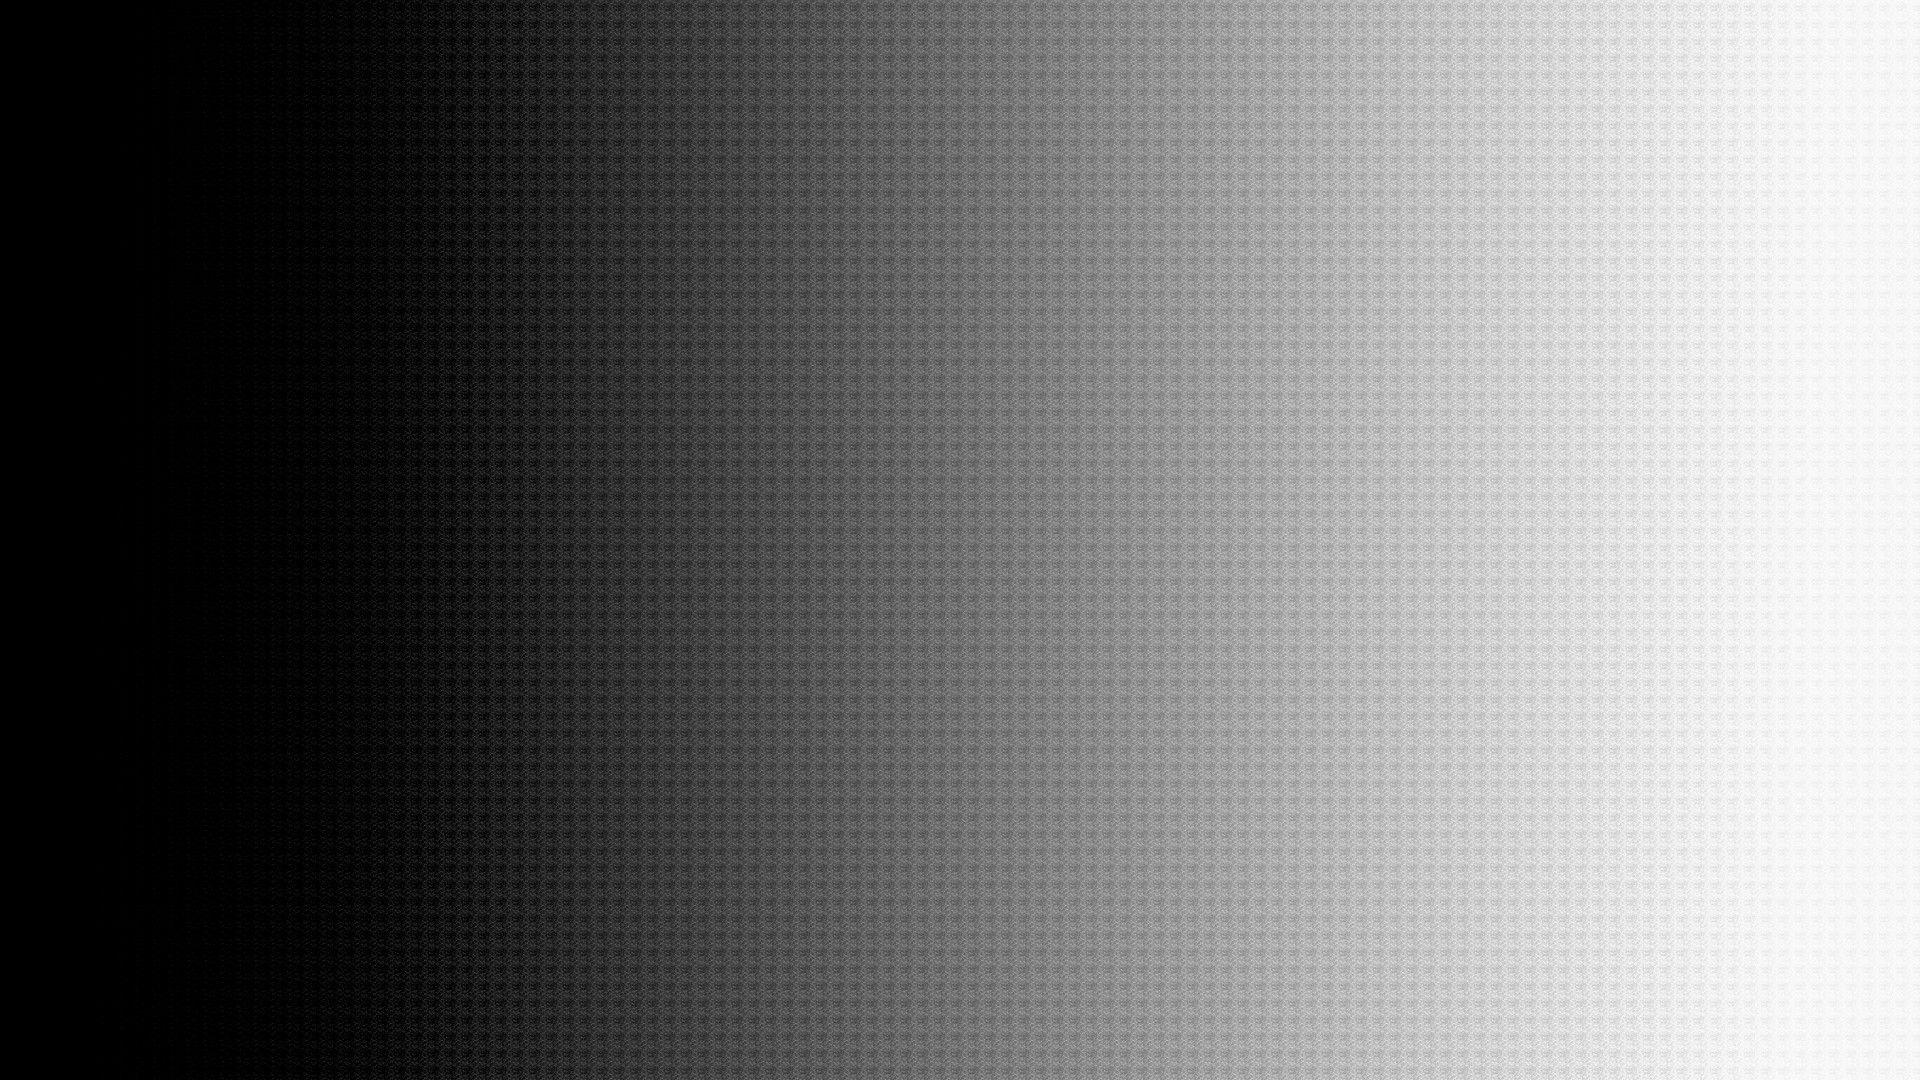 Light Grey background wallpaper